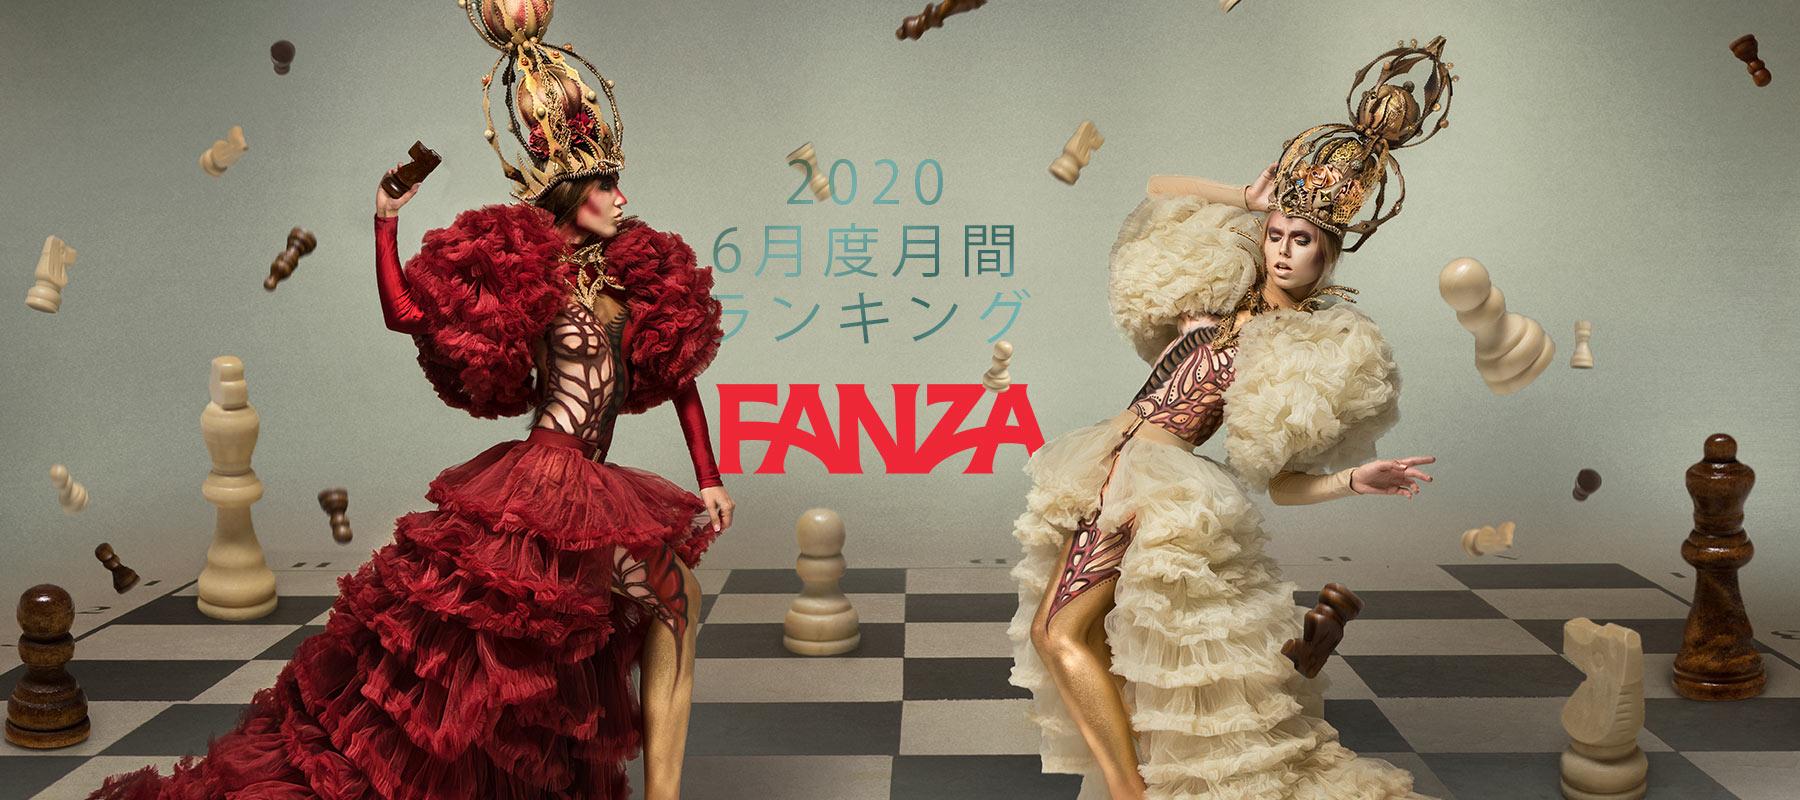 FANZA月間ランキング(2020年6月度)